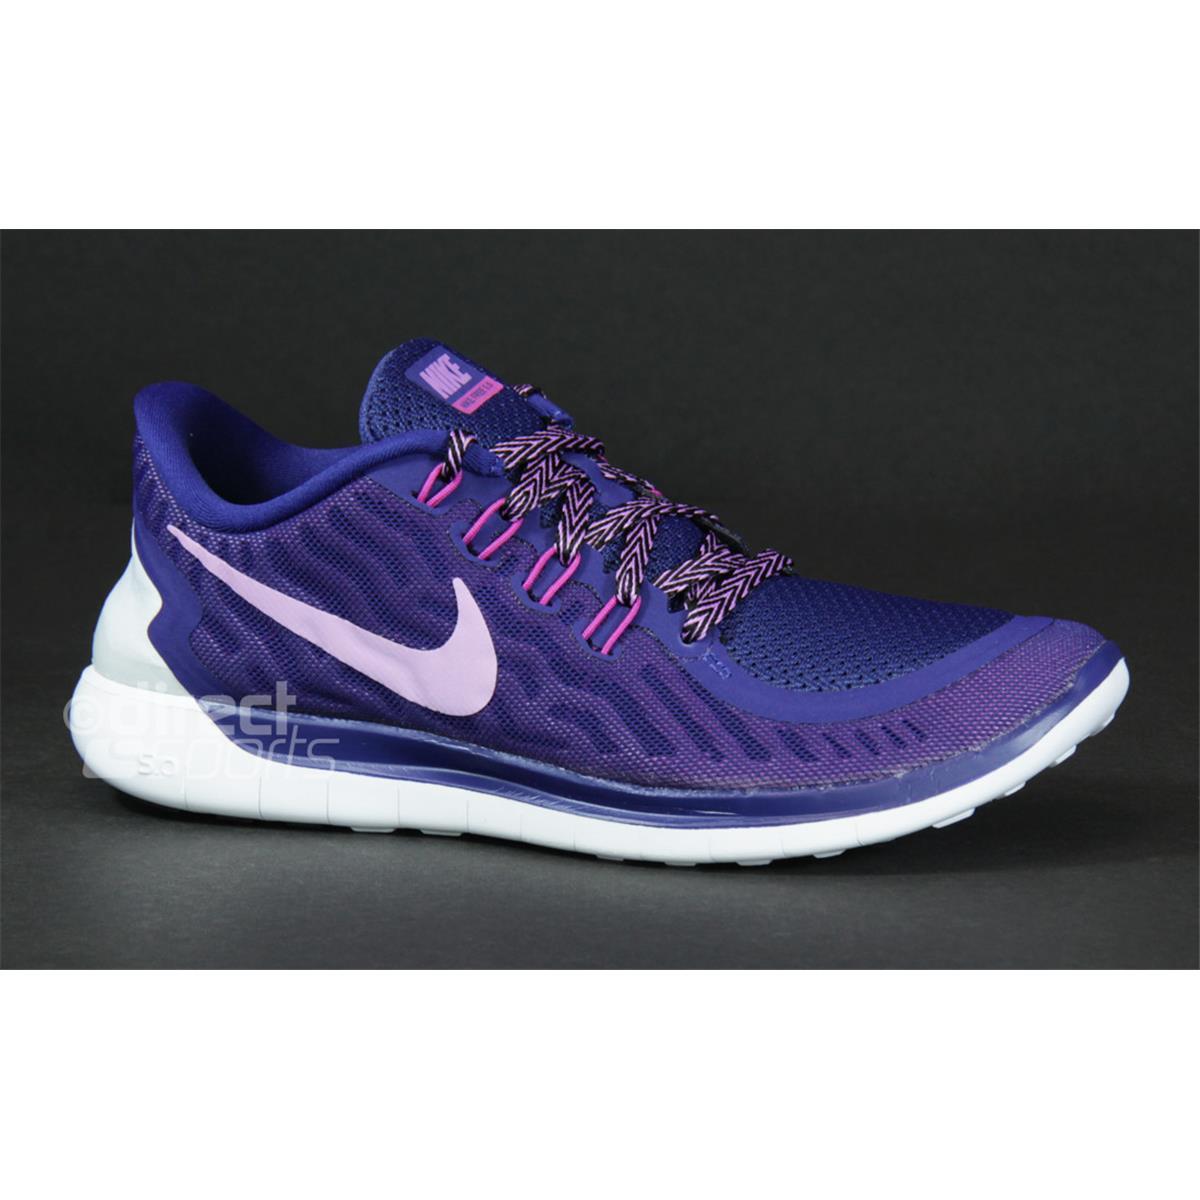 Nike Free 5.0 Royal Blue